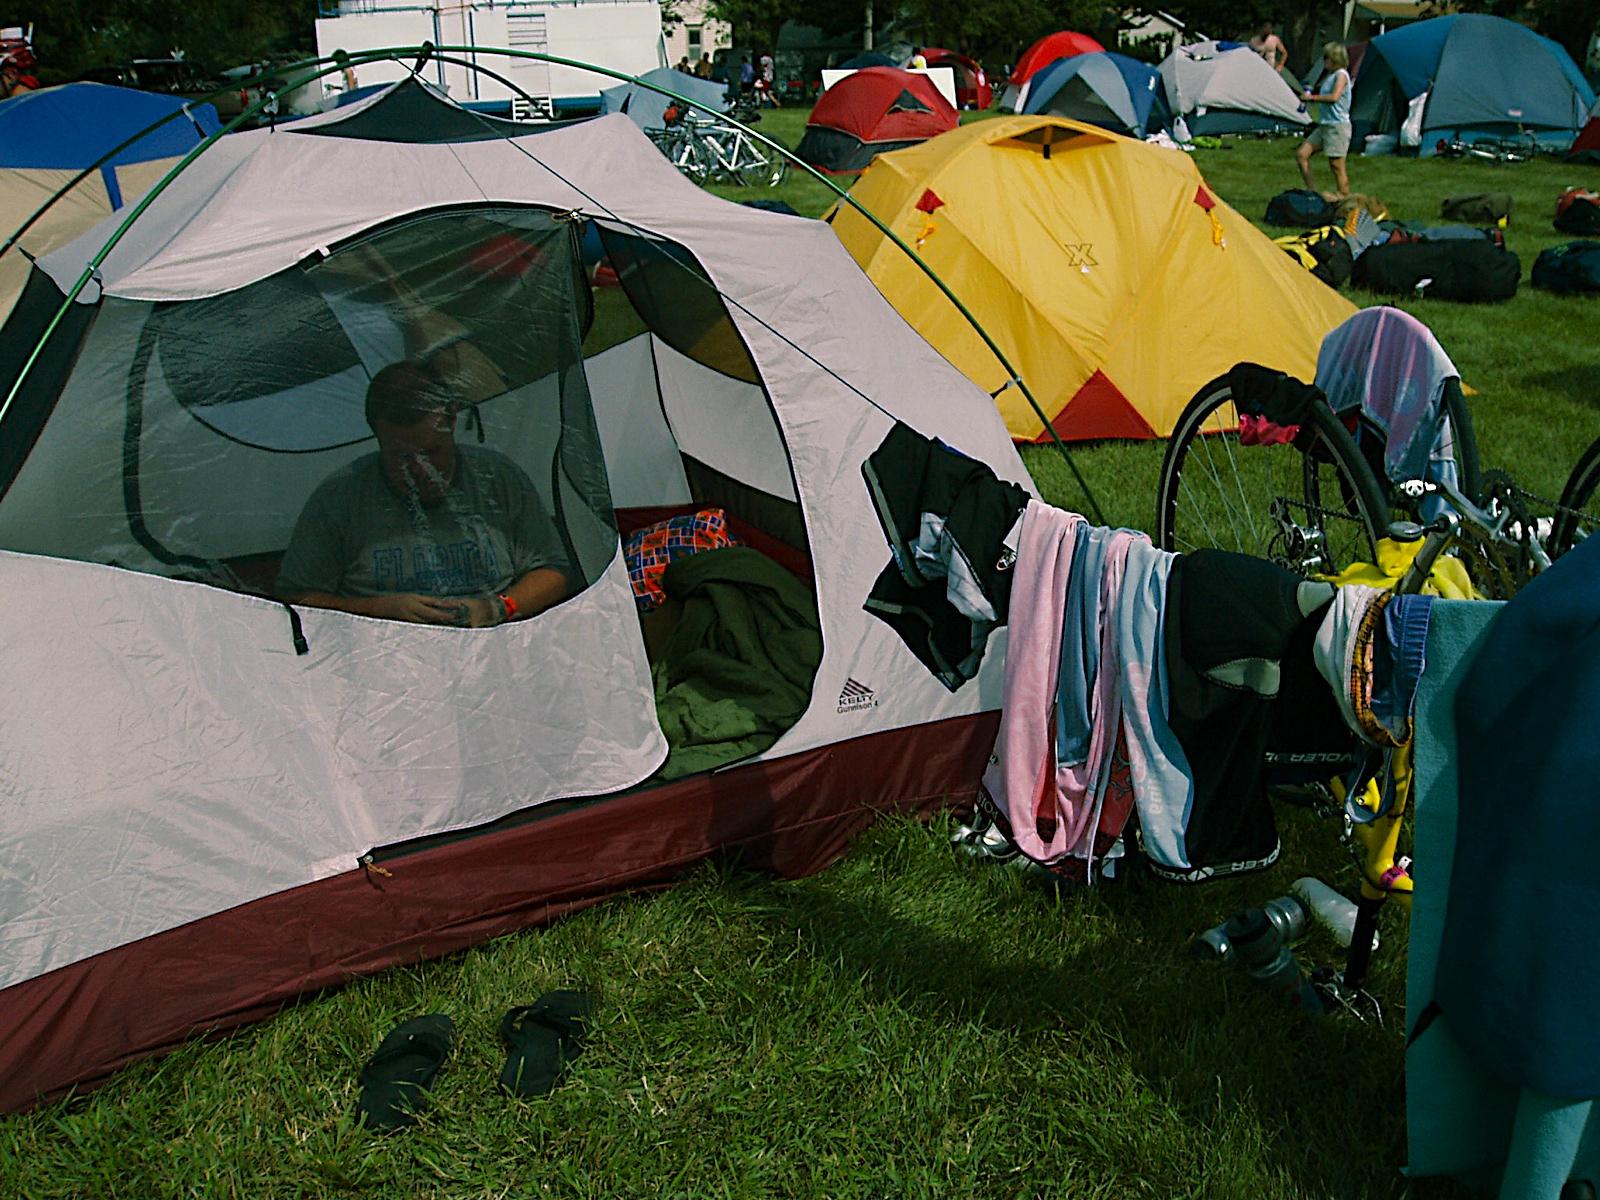 Camp made